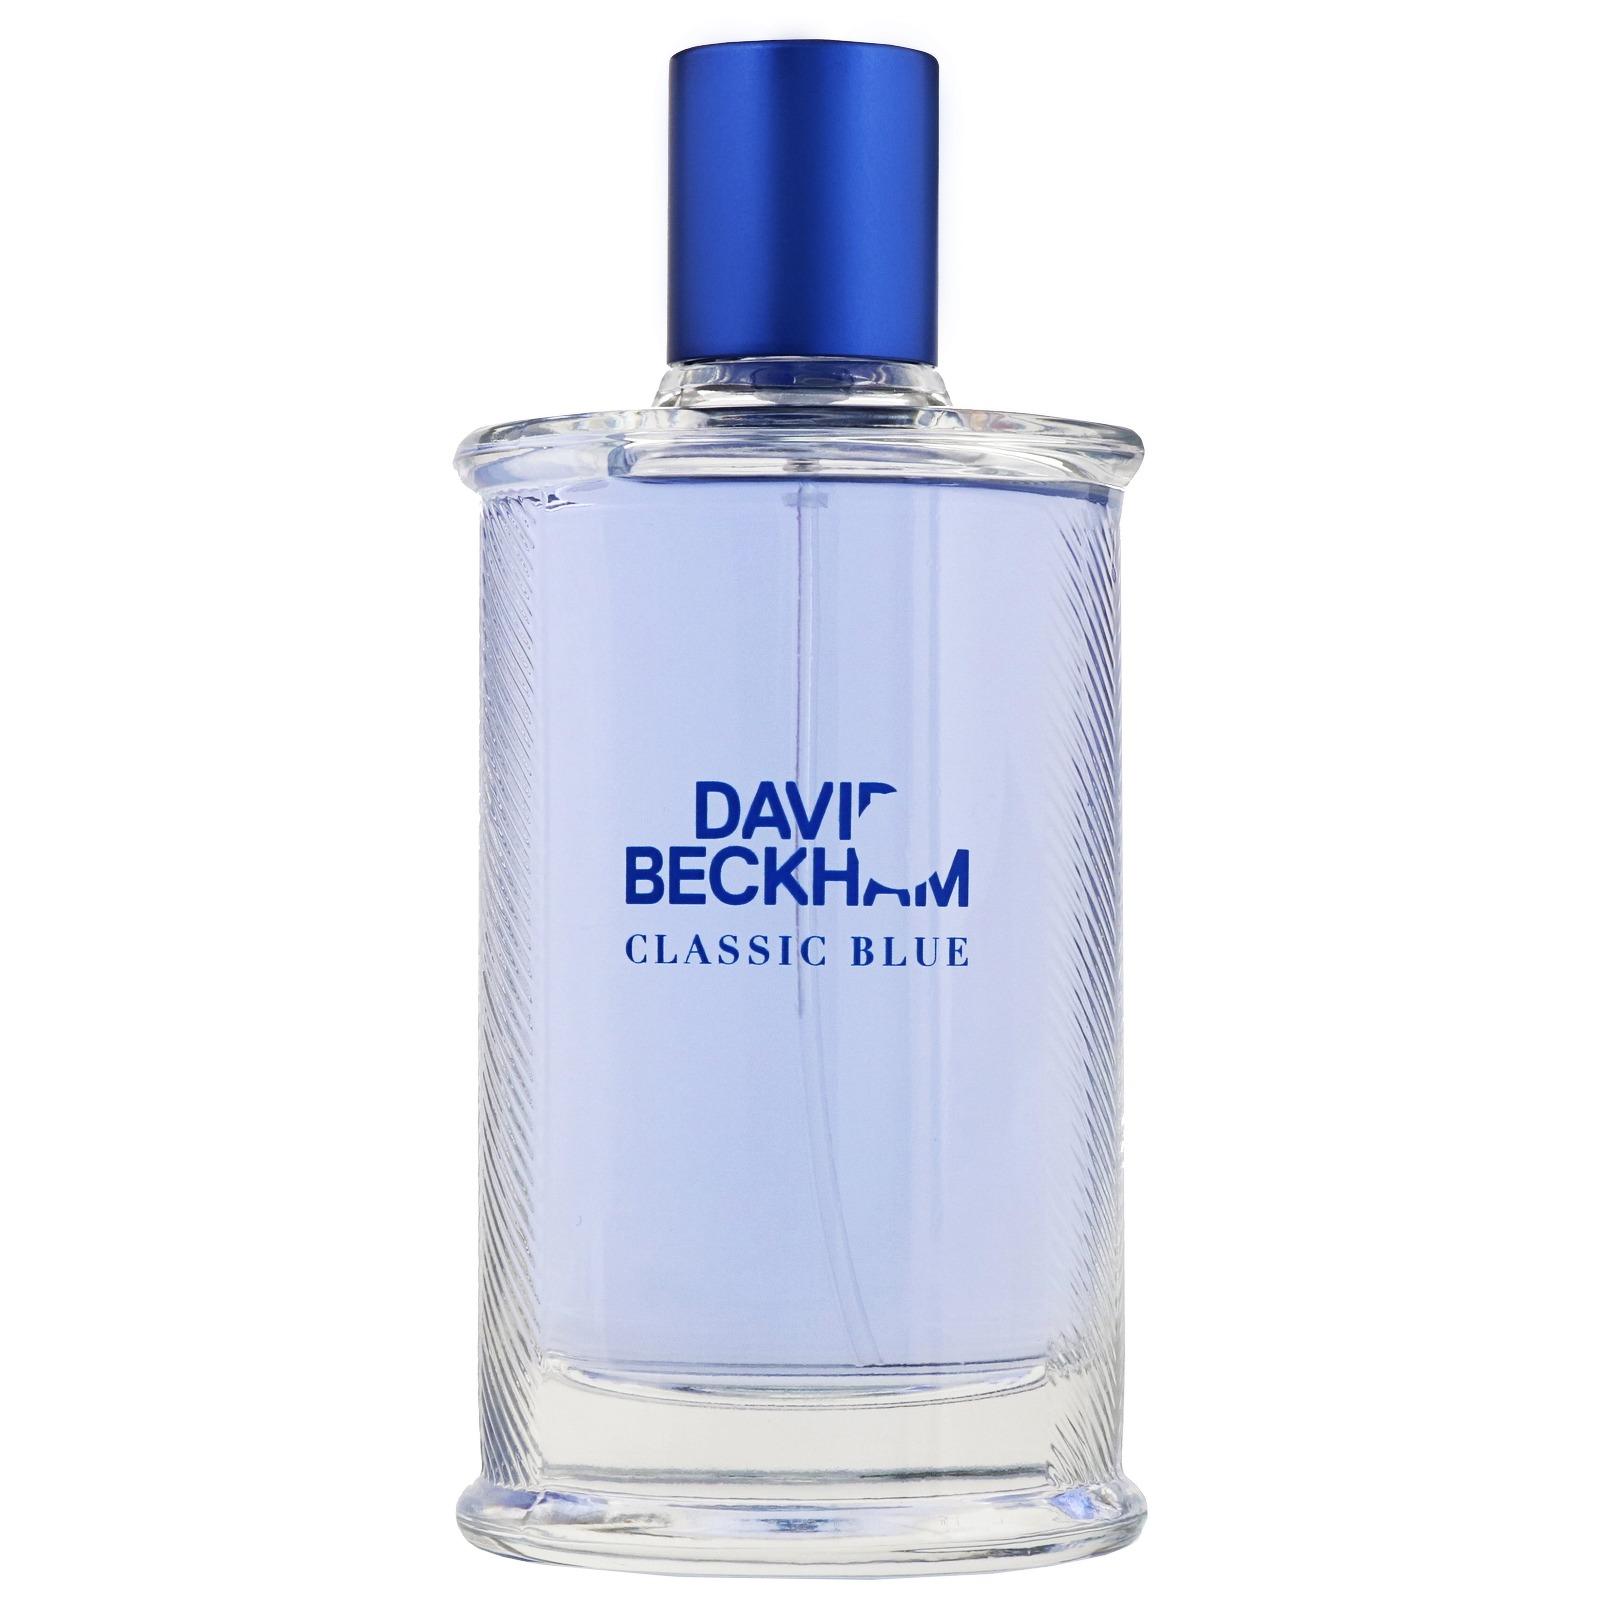 ادو تویلت مردانه دیوید بکهام مدل Classic Blue حجم 90 میلی لیتر